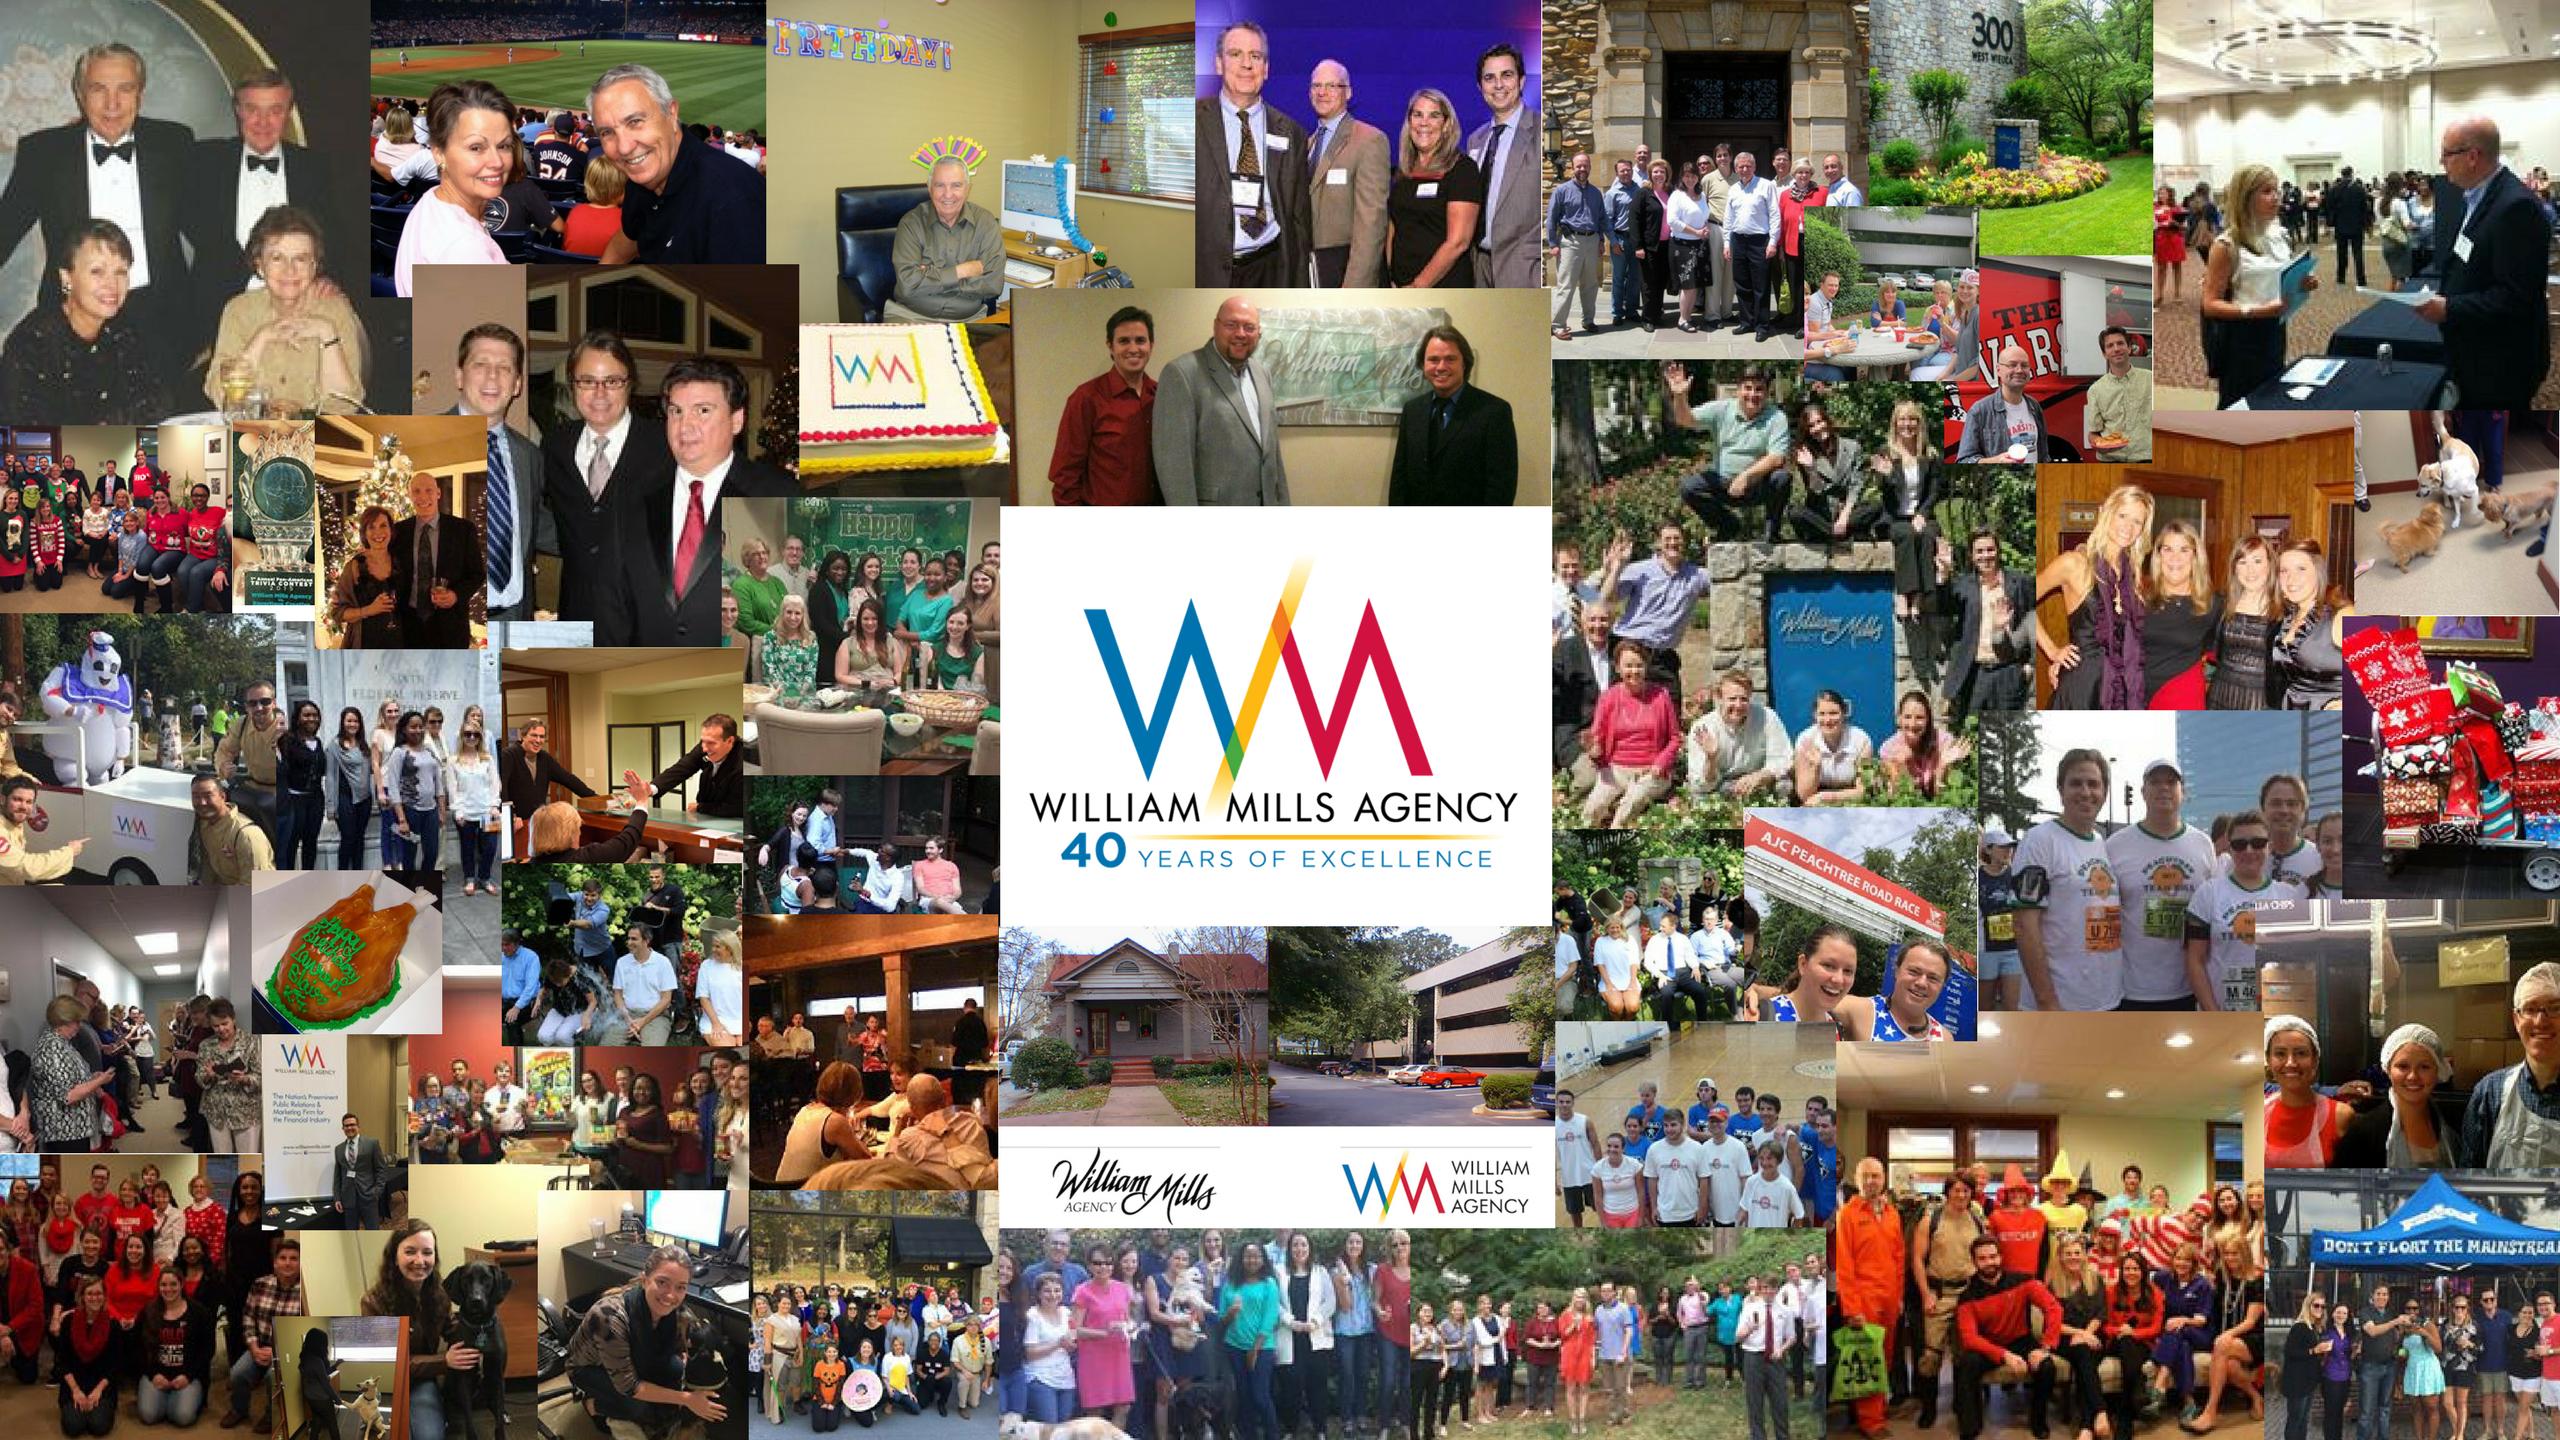 William Mills Agency 40th Anniversary